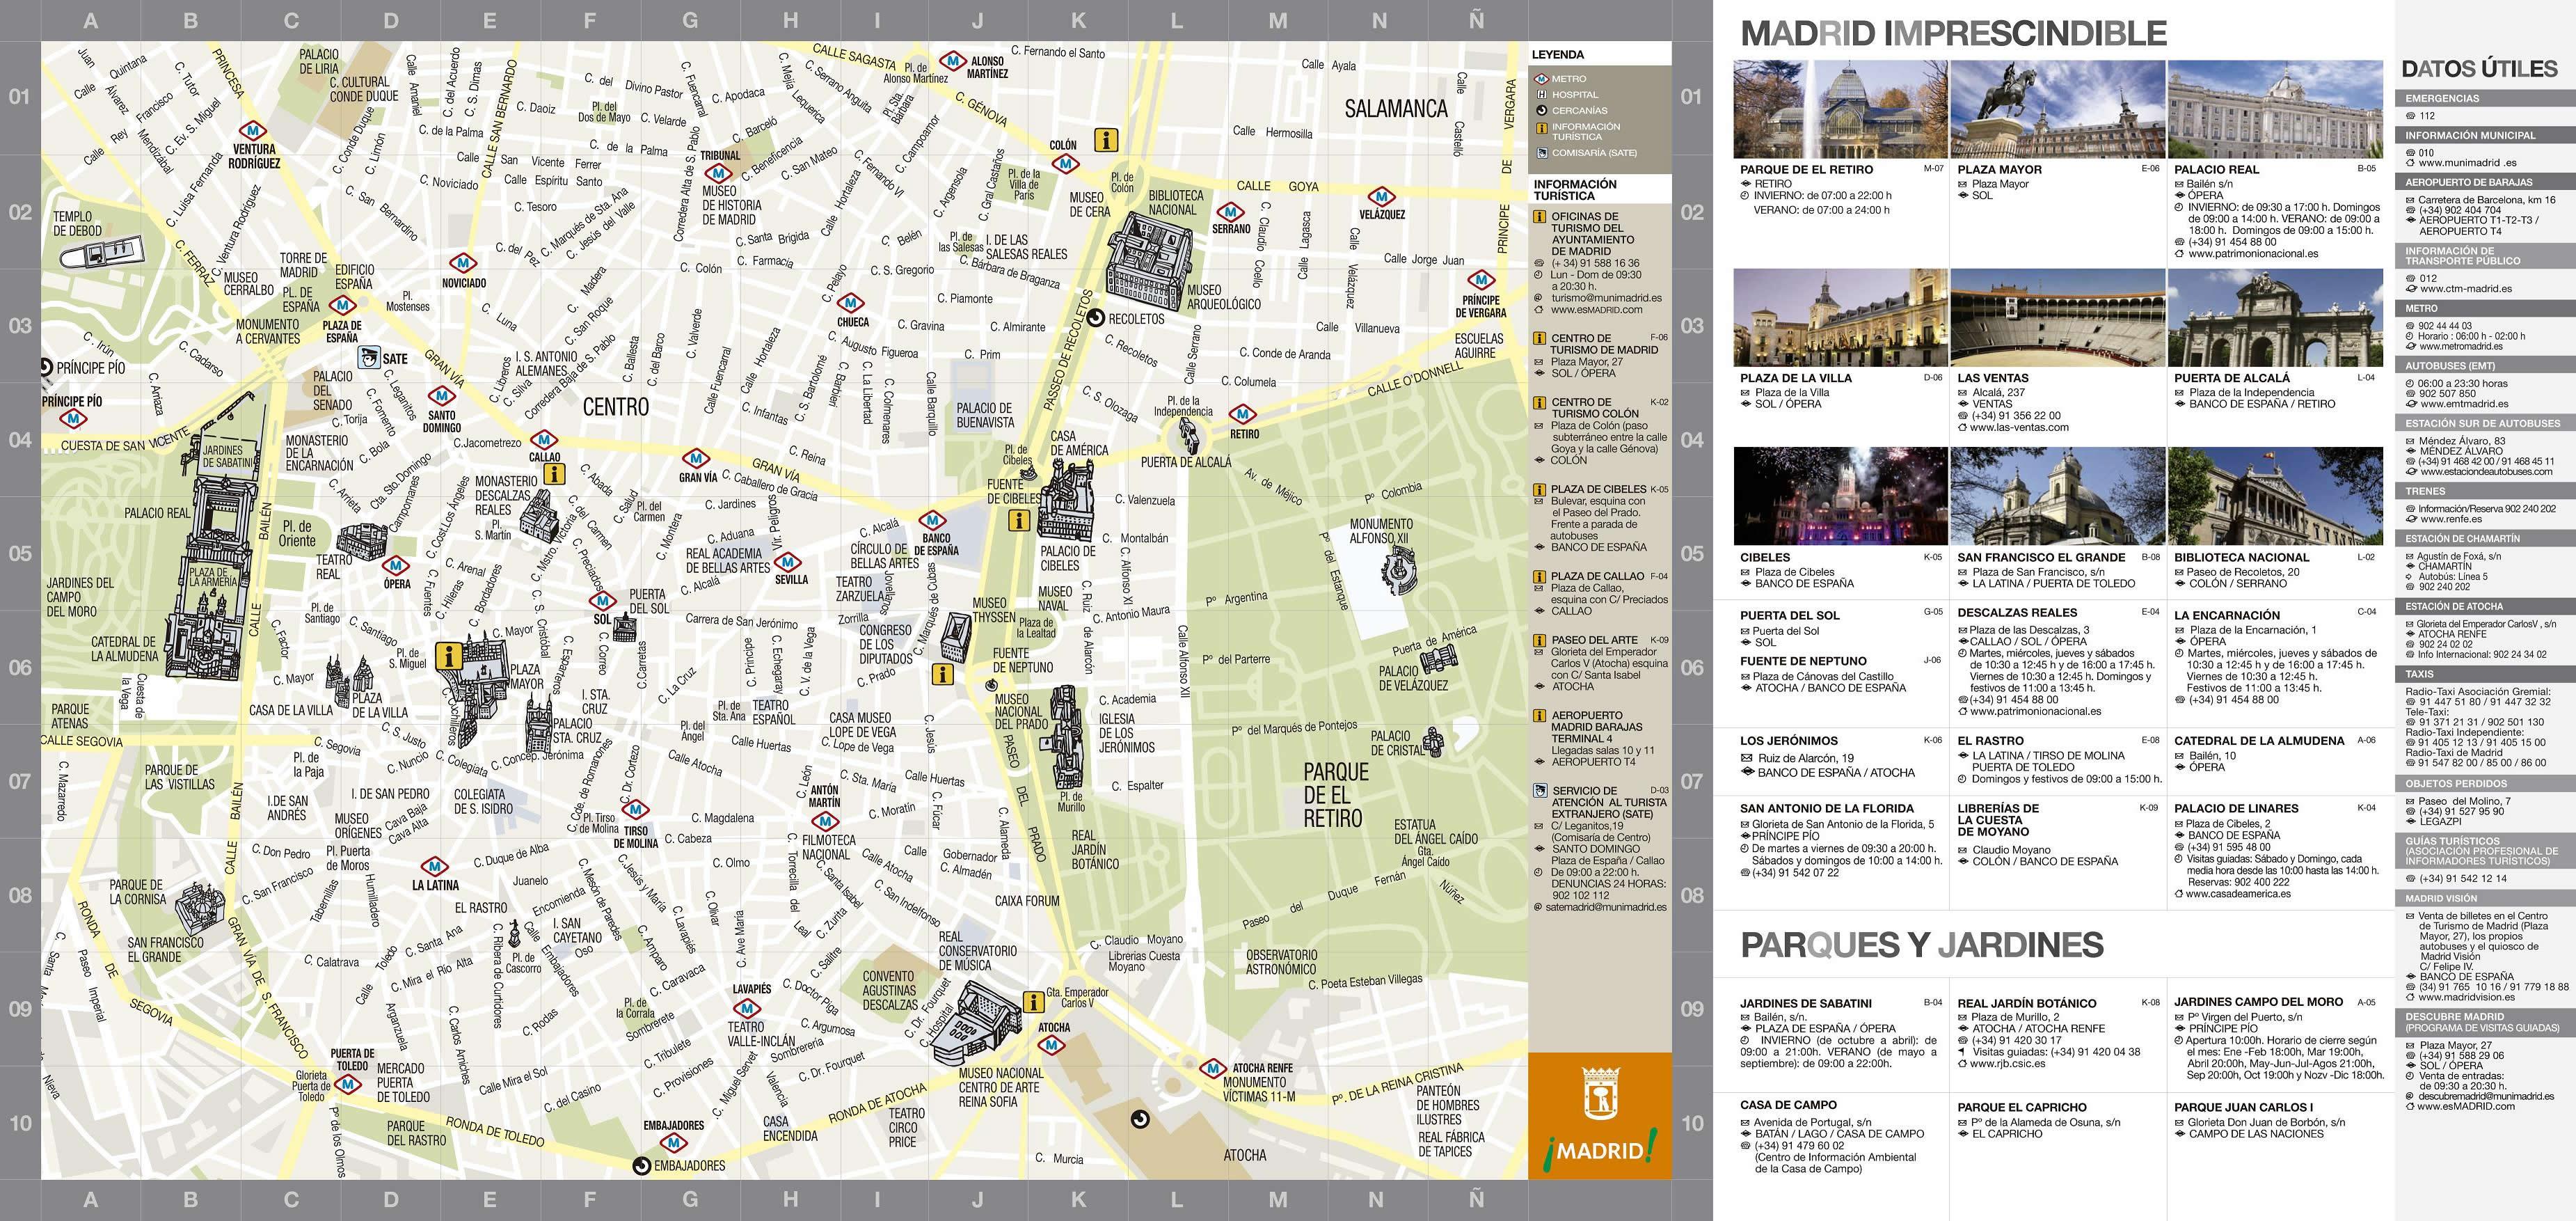 Madrid tourist map 2009